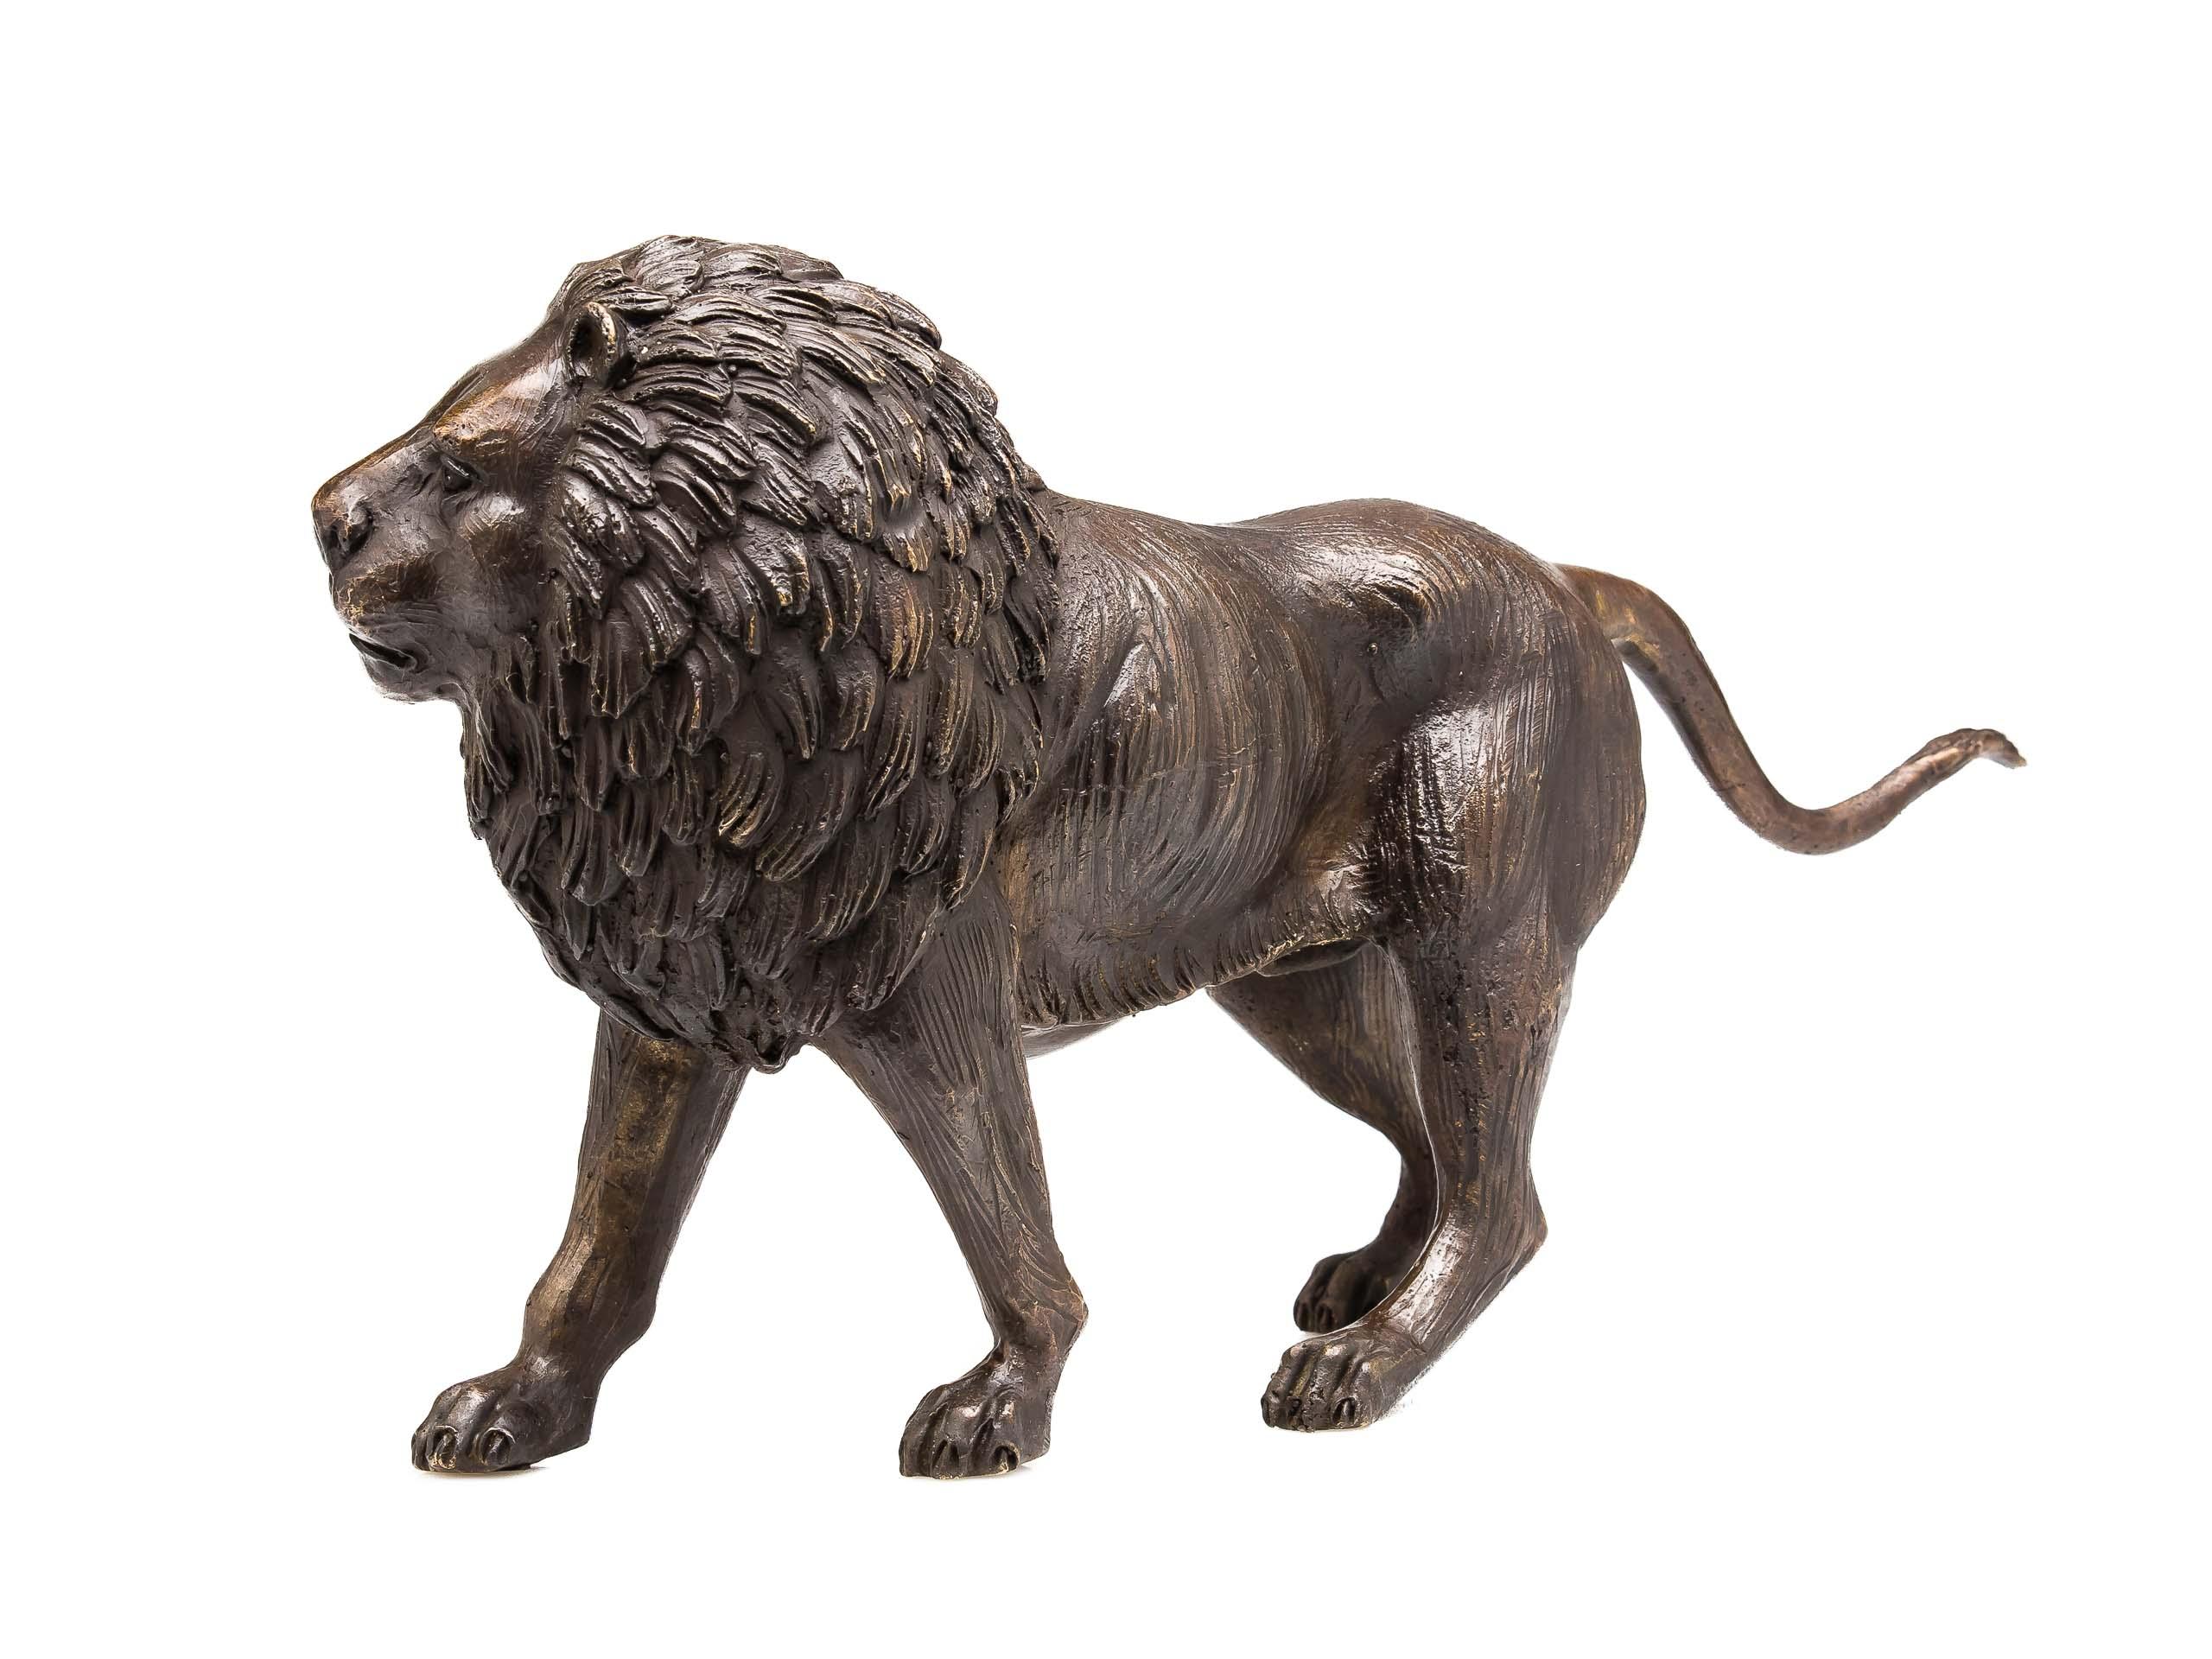 Bronze Skulptur Figur Löwe Lion Bronzeskulptur Bronzefigur Sculpture 31cm